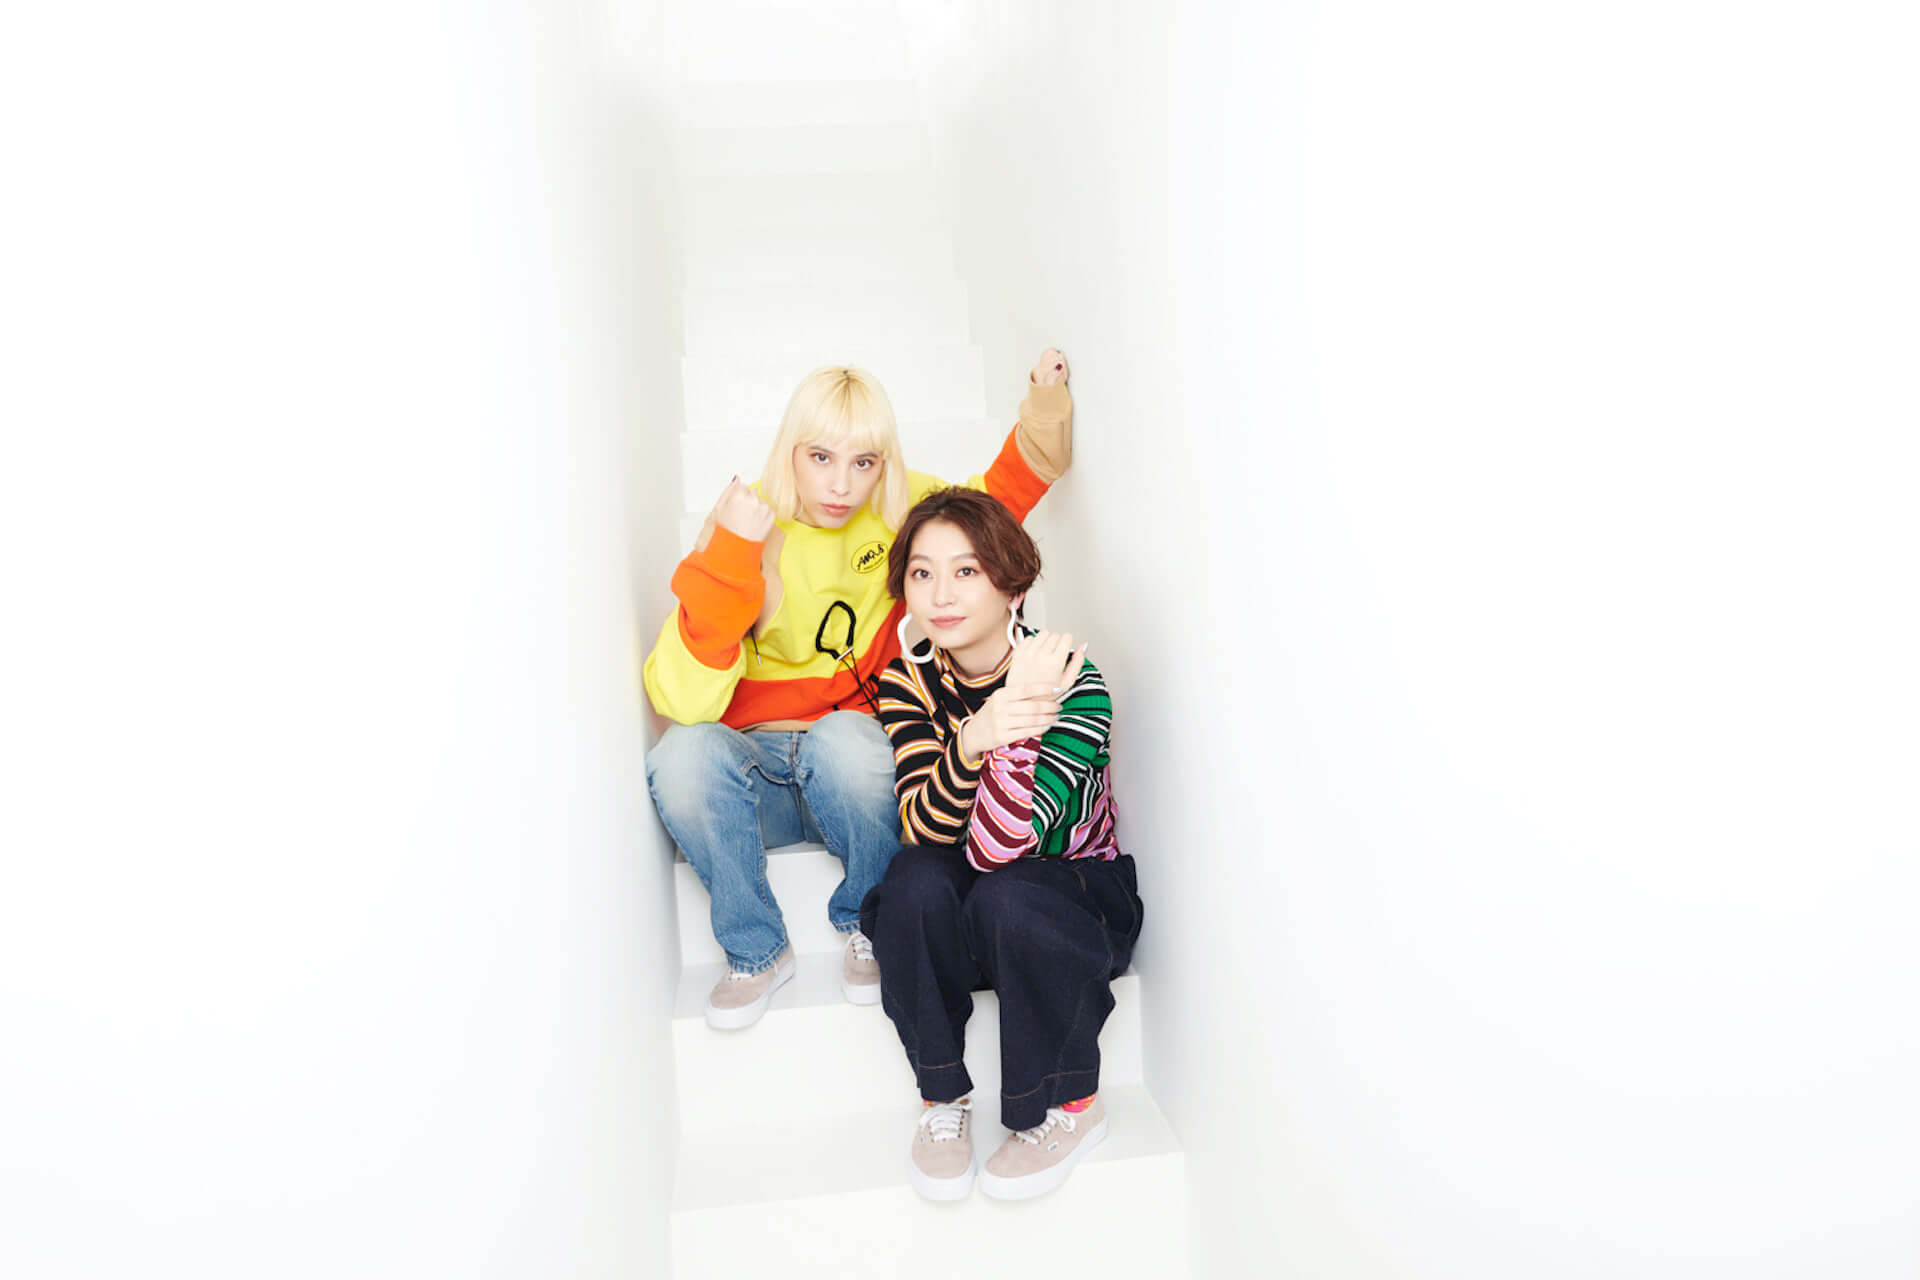 chelmicoの新シングル「Terminal 着、即 Dance」がリリース決定!明日生配信番組も急遽実施 music200316_chelmico_3-1920x1280